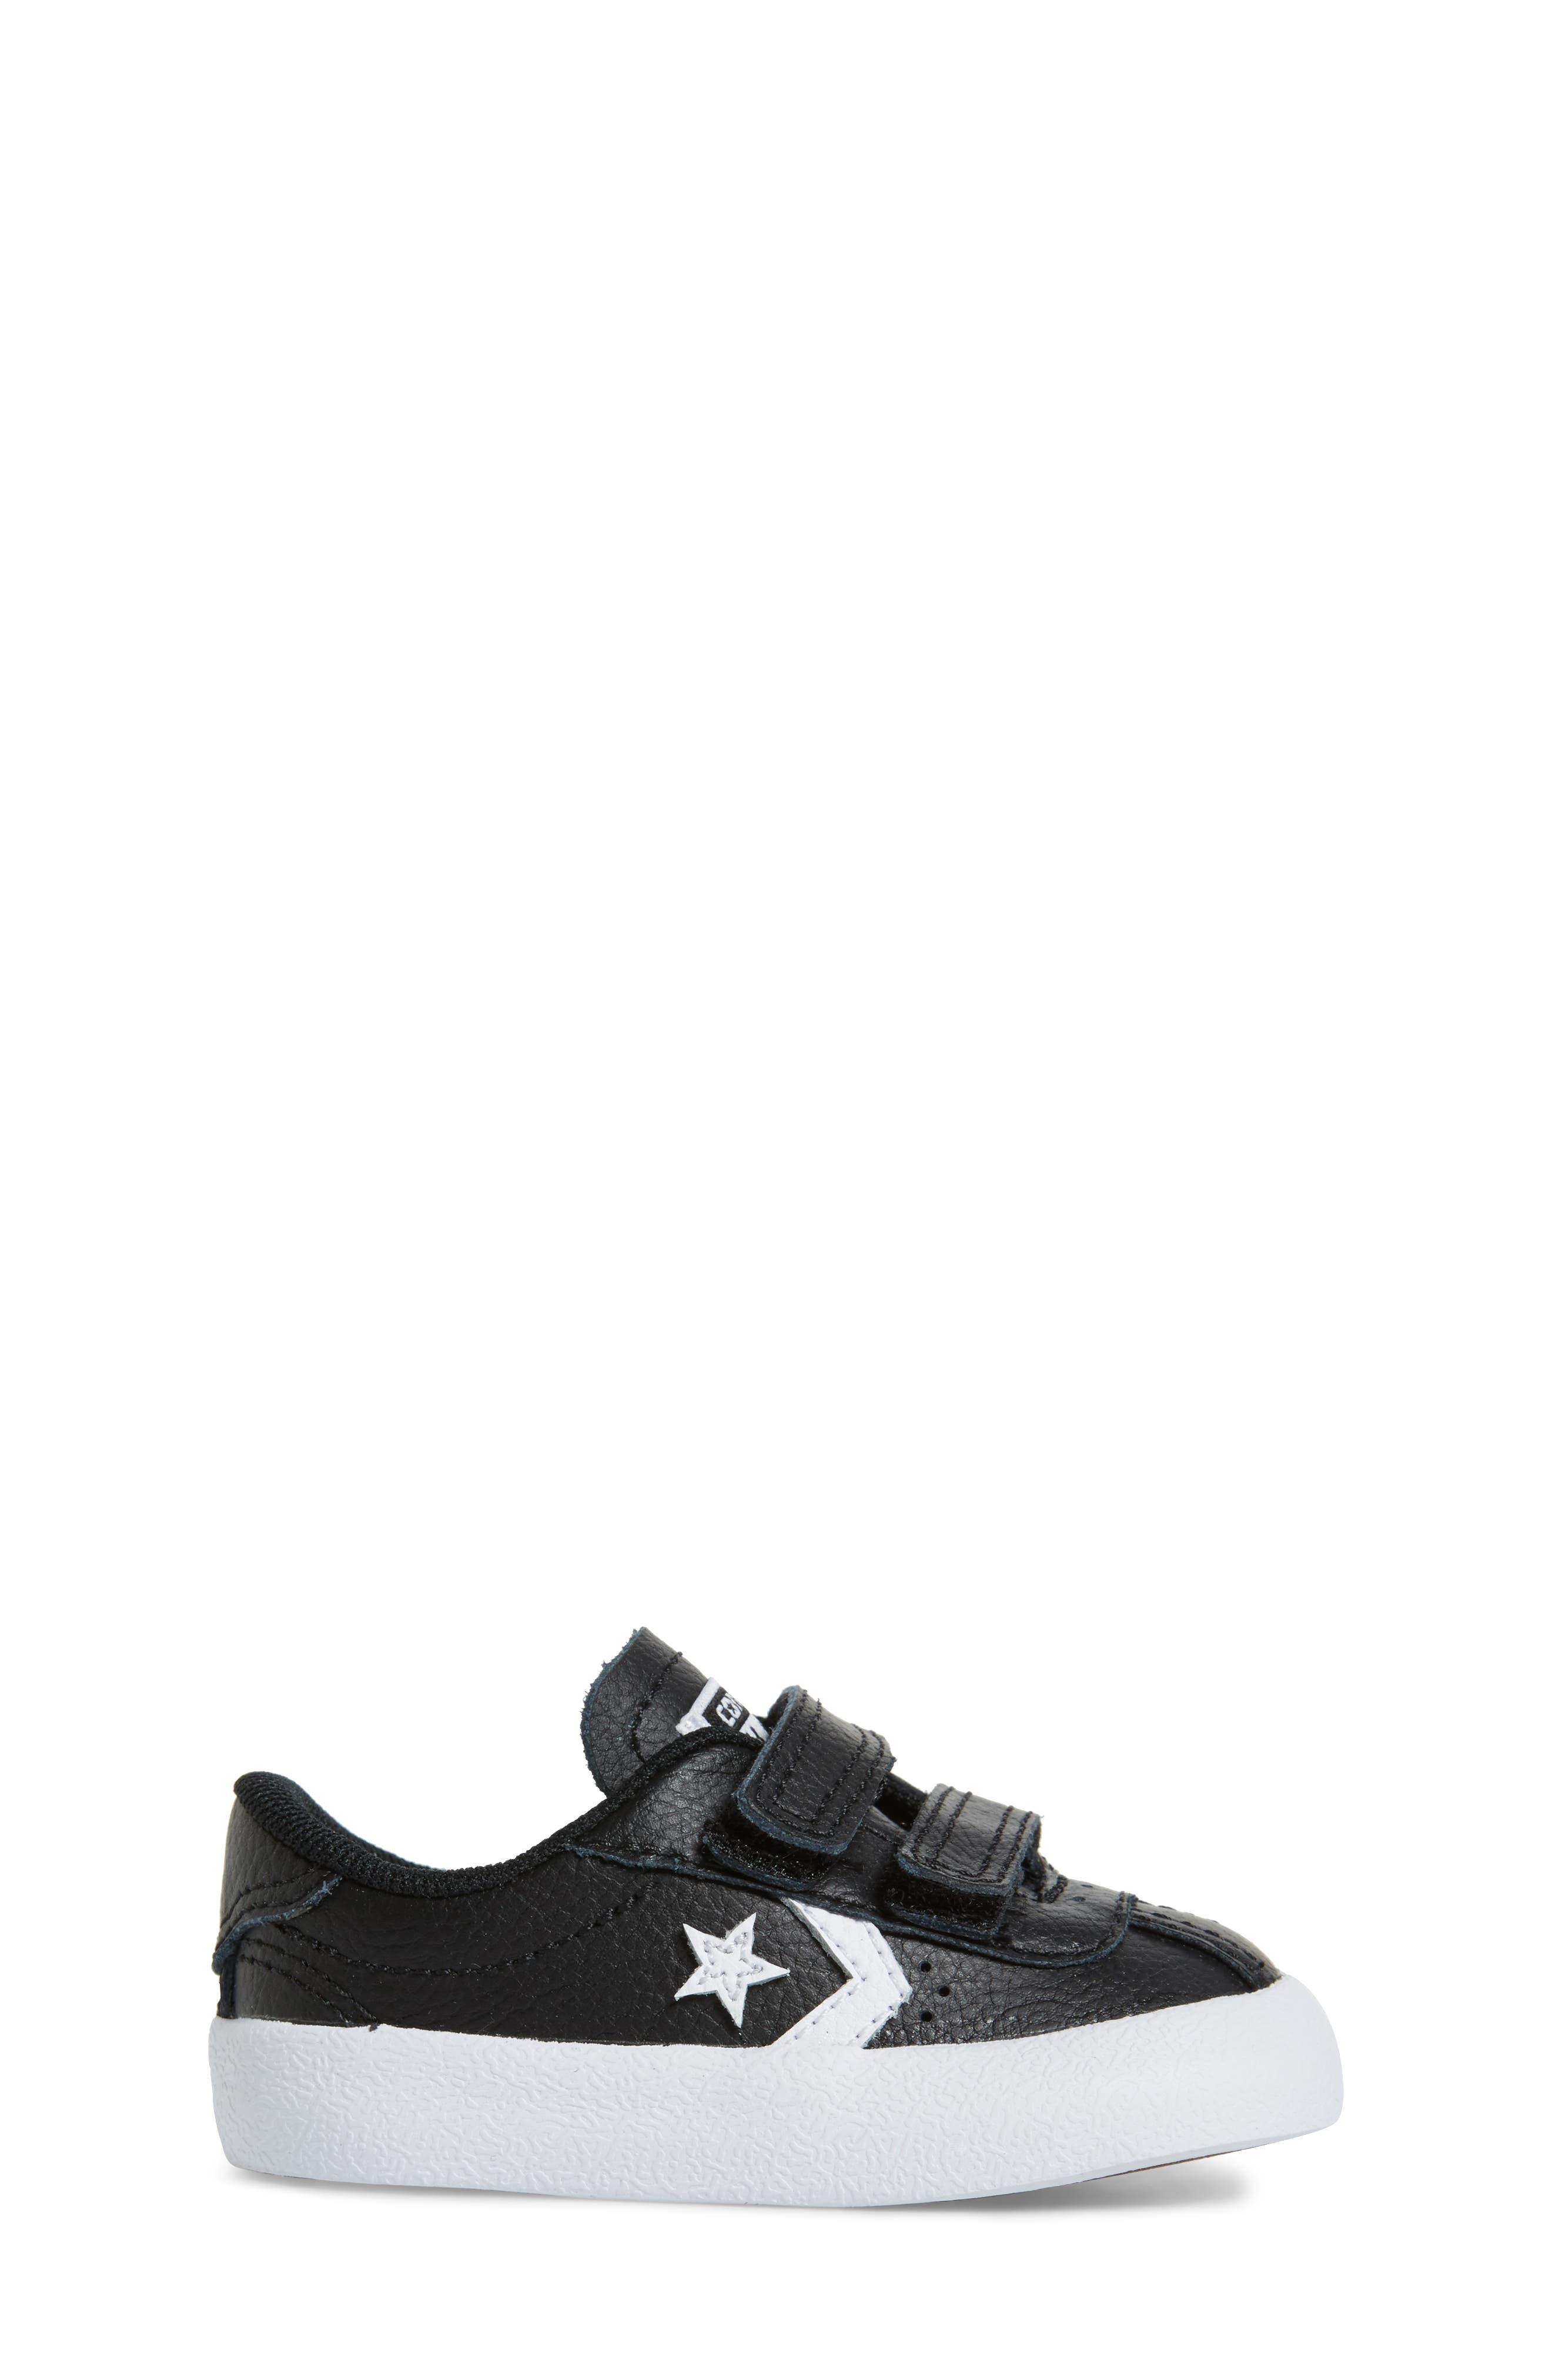 Breakpoint Pro Sneaker,                             Alternate thumbnail 3, color,                             001